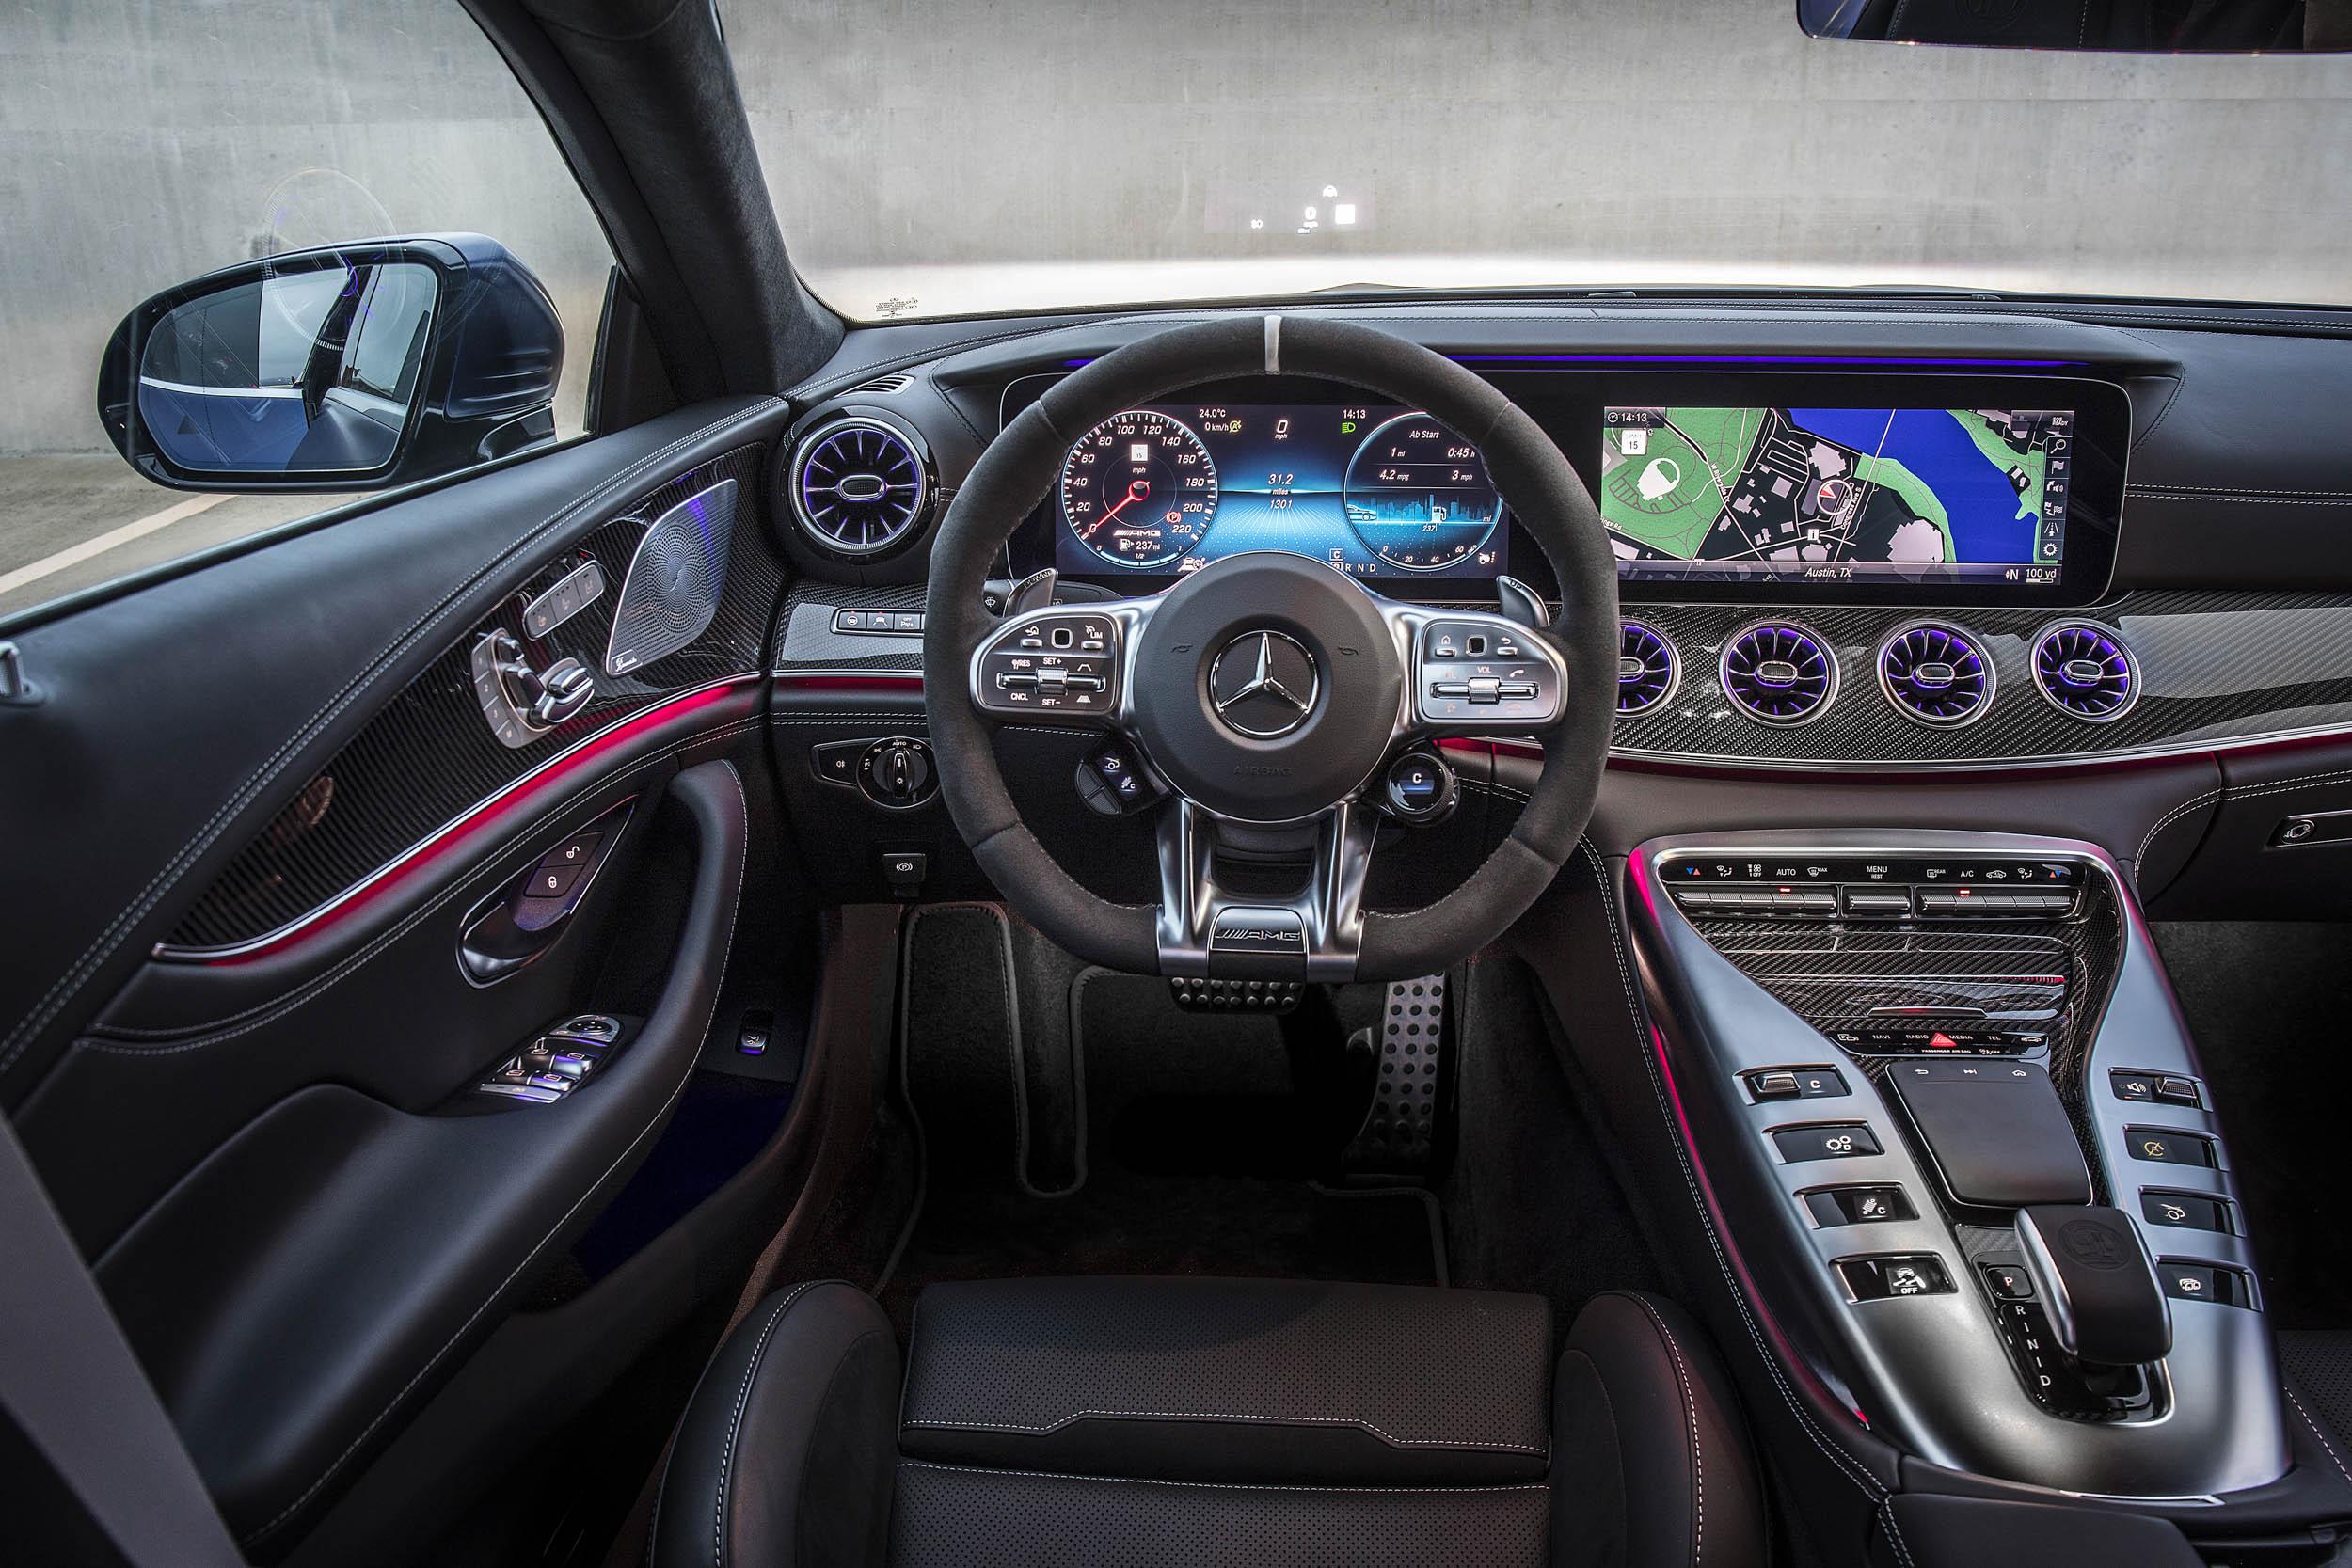 Mercedes-AMG GT 63 S interior lit up